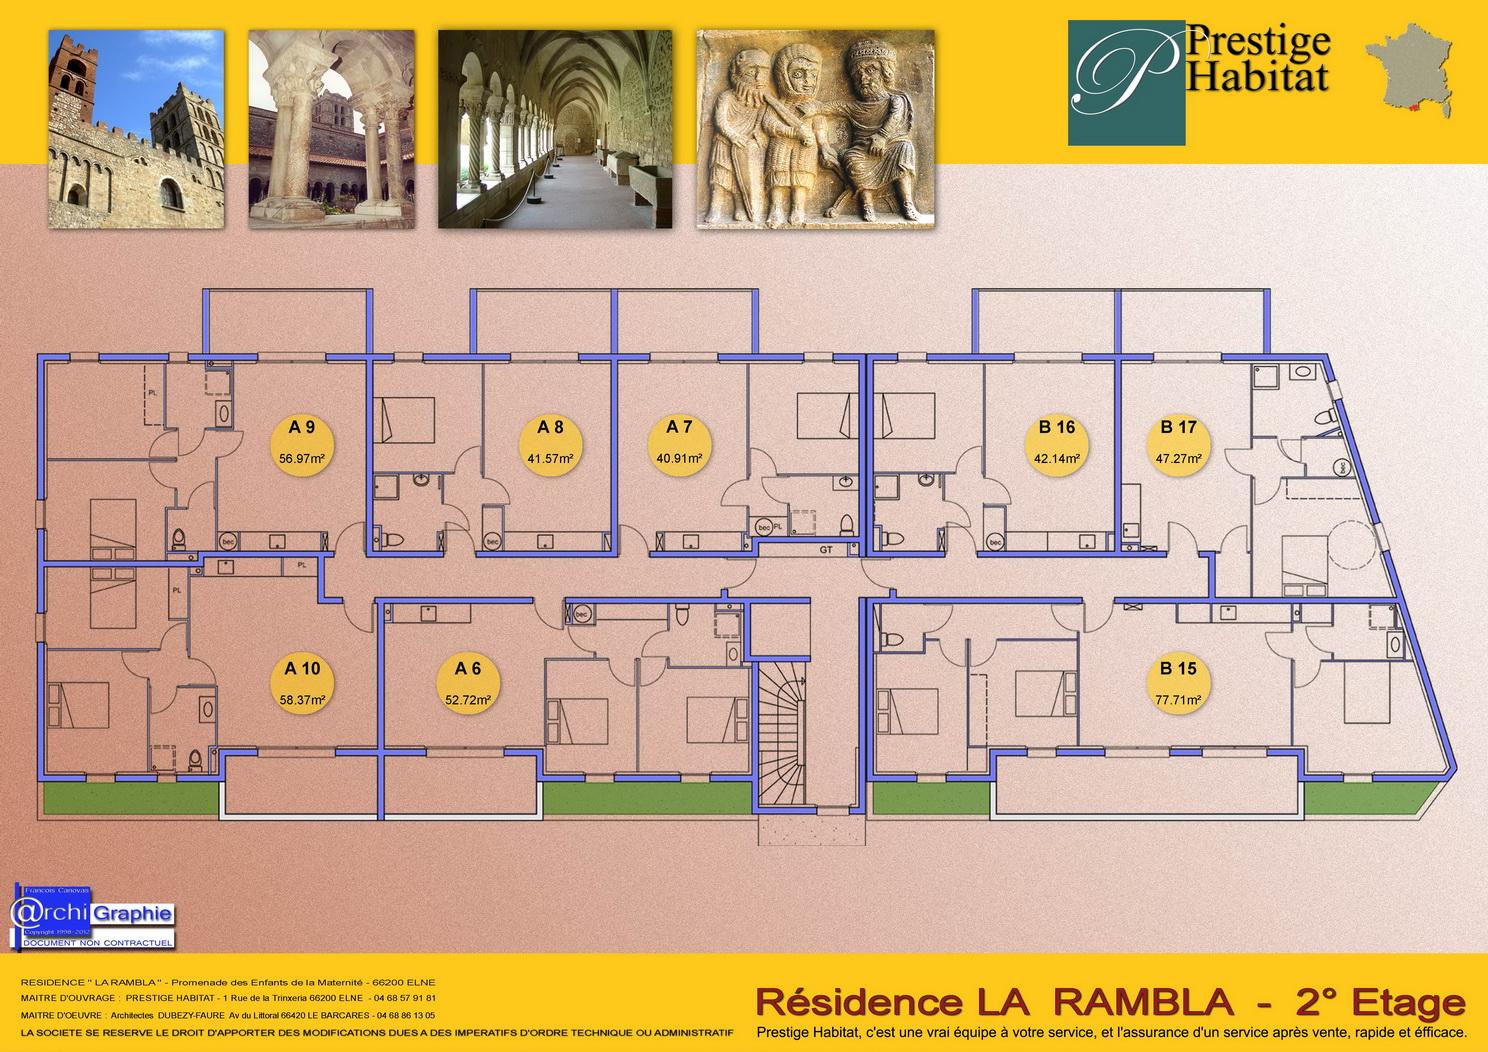 Rambla-Etage+2